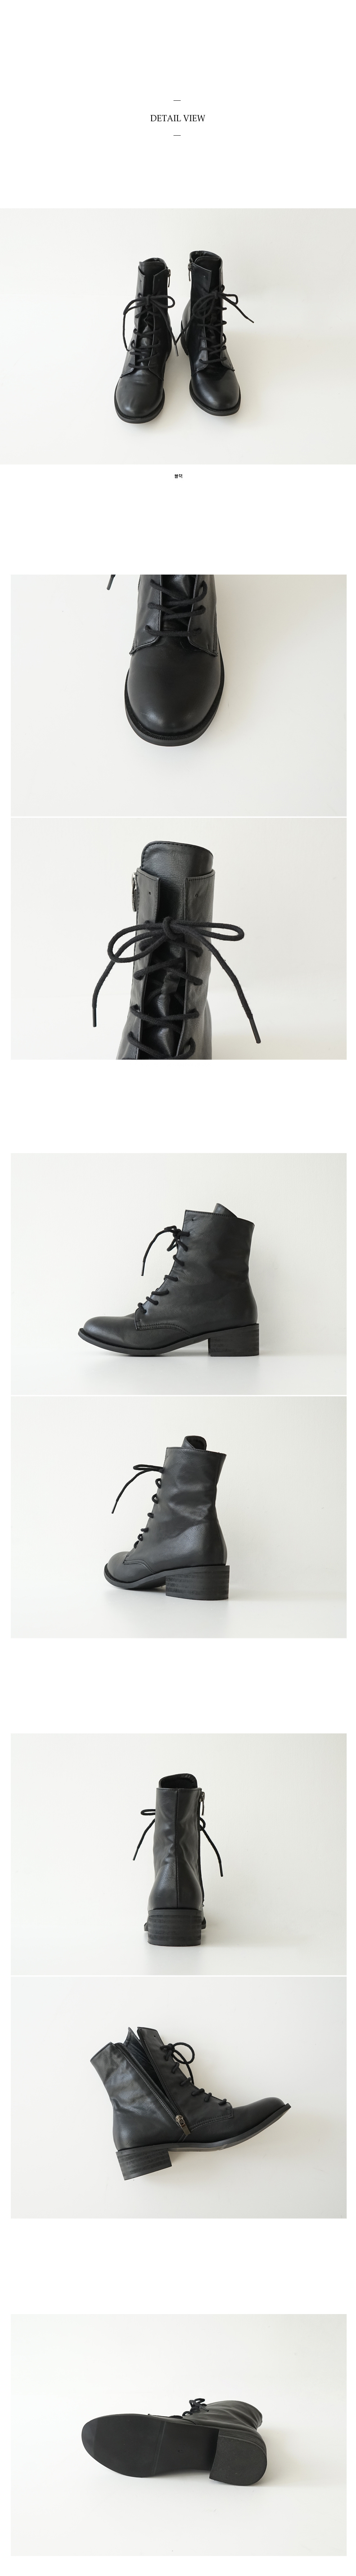 walker ankle boots